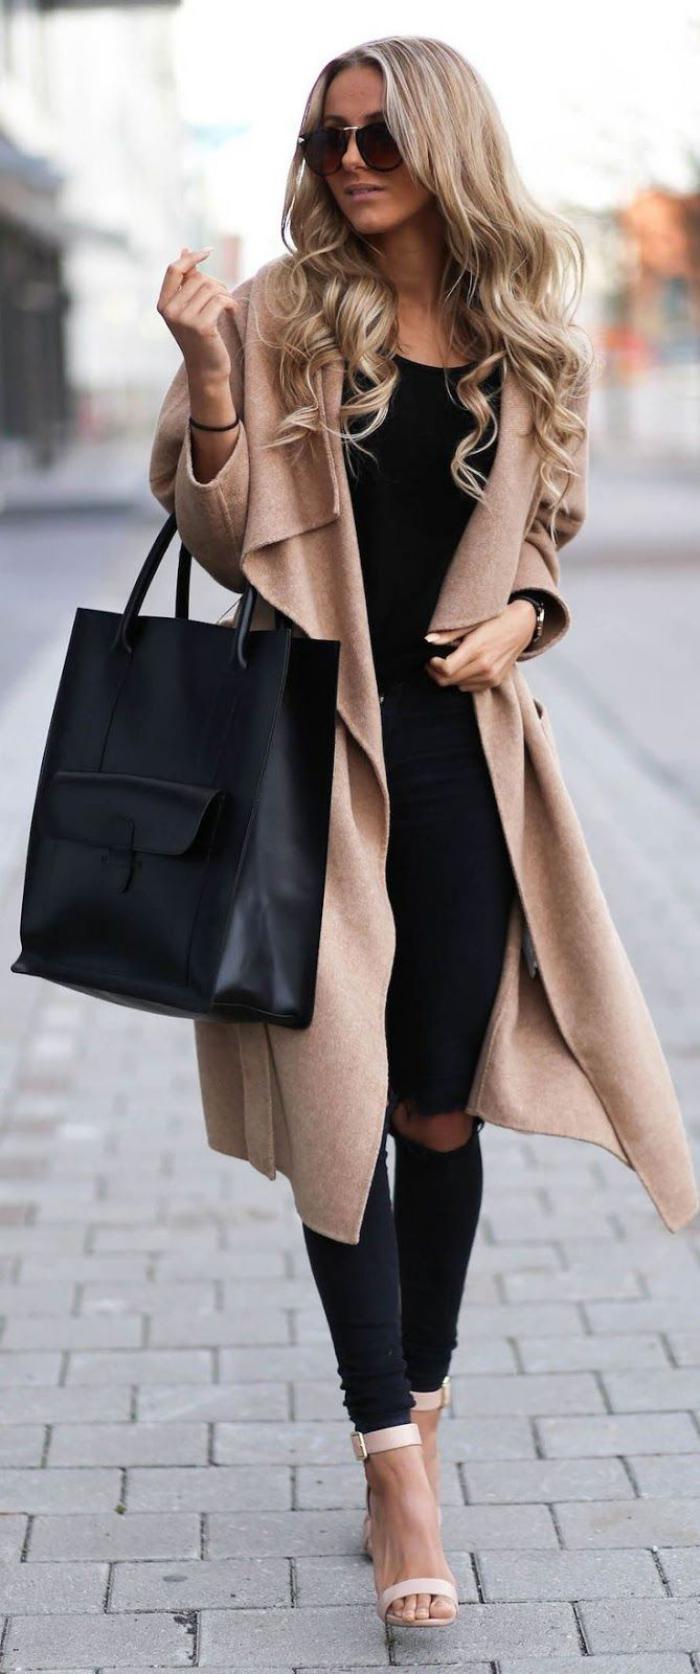 Damen-Mantel-Karamell-Farbe-zerrissene-schwarze-Hosen-Sandalen-extravagante-Vision